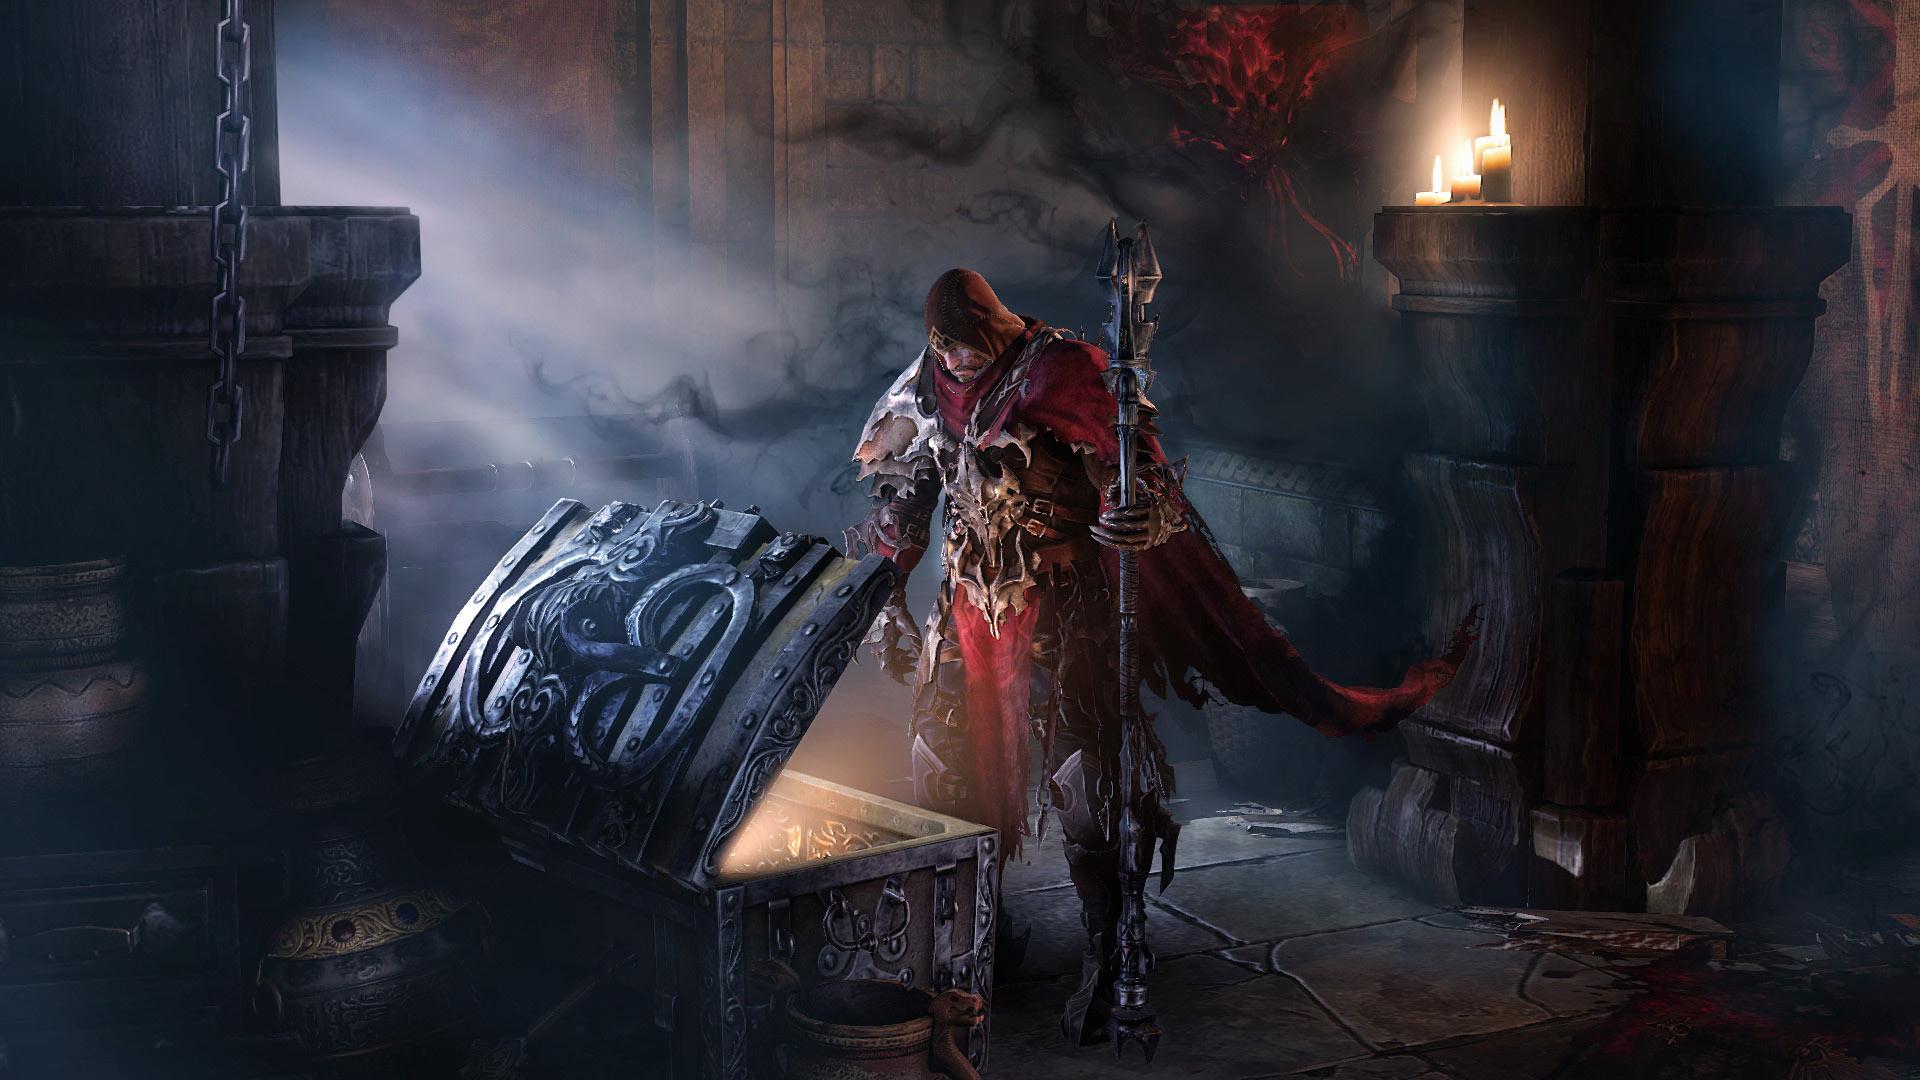 KHAiHOM.com - Lords of the Fallen - Monk Decipher